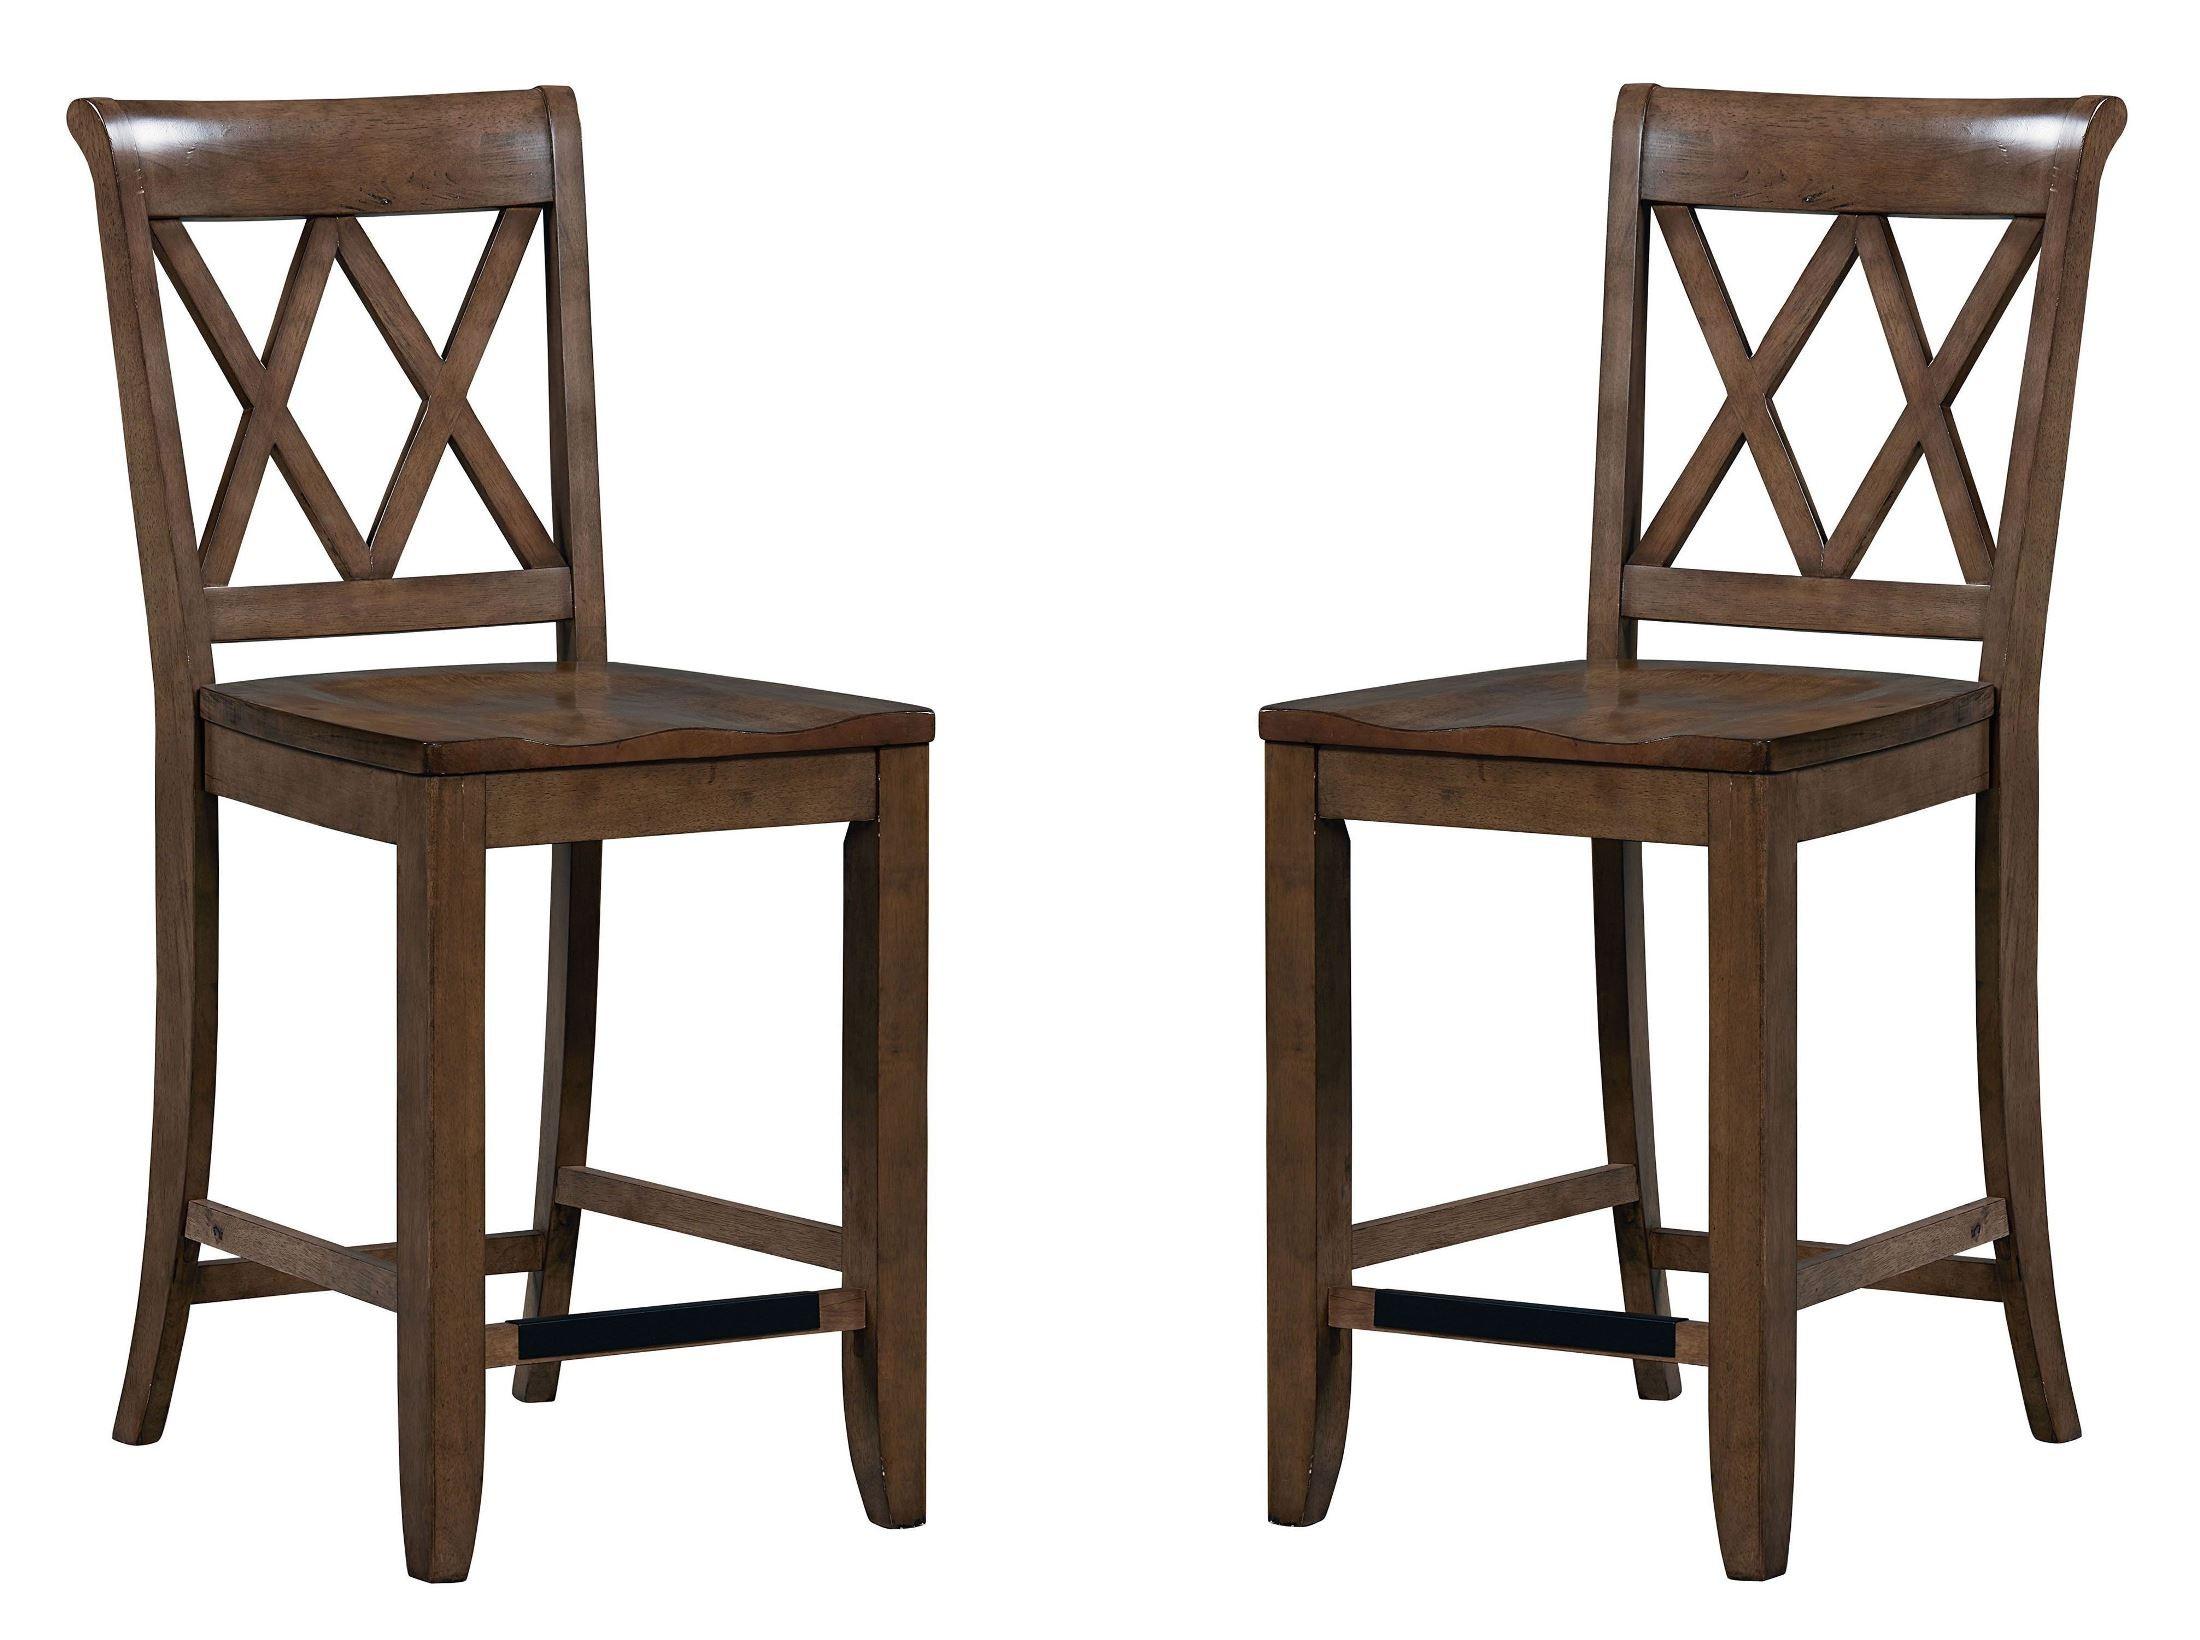 Counter Height X Back Chairs : Bar Furniture > Bar Stools, Counter Stools > Counter Seat Height ...